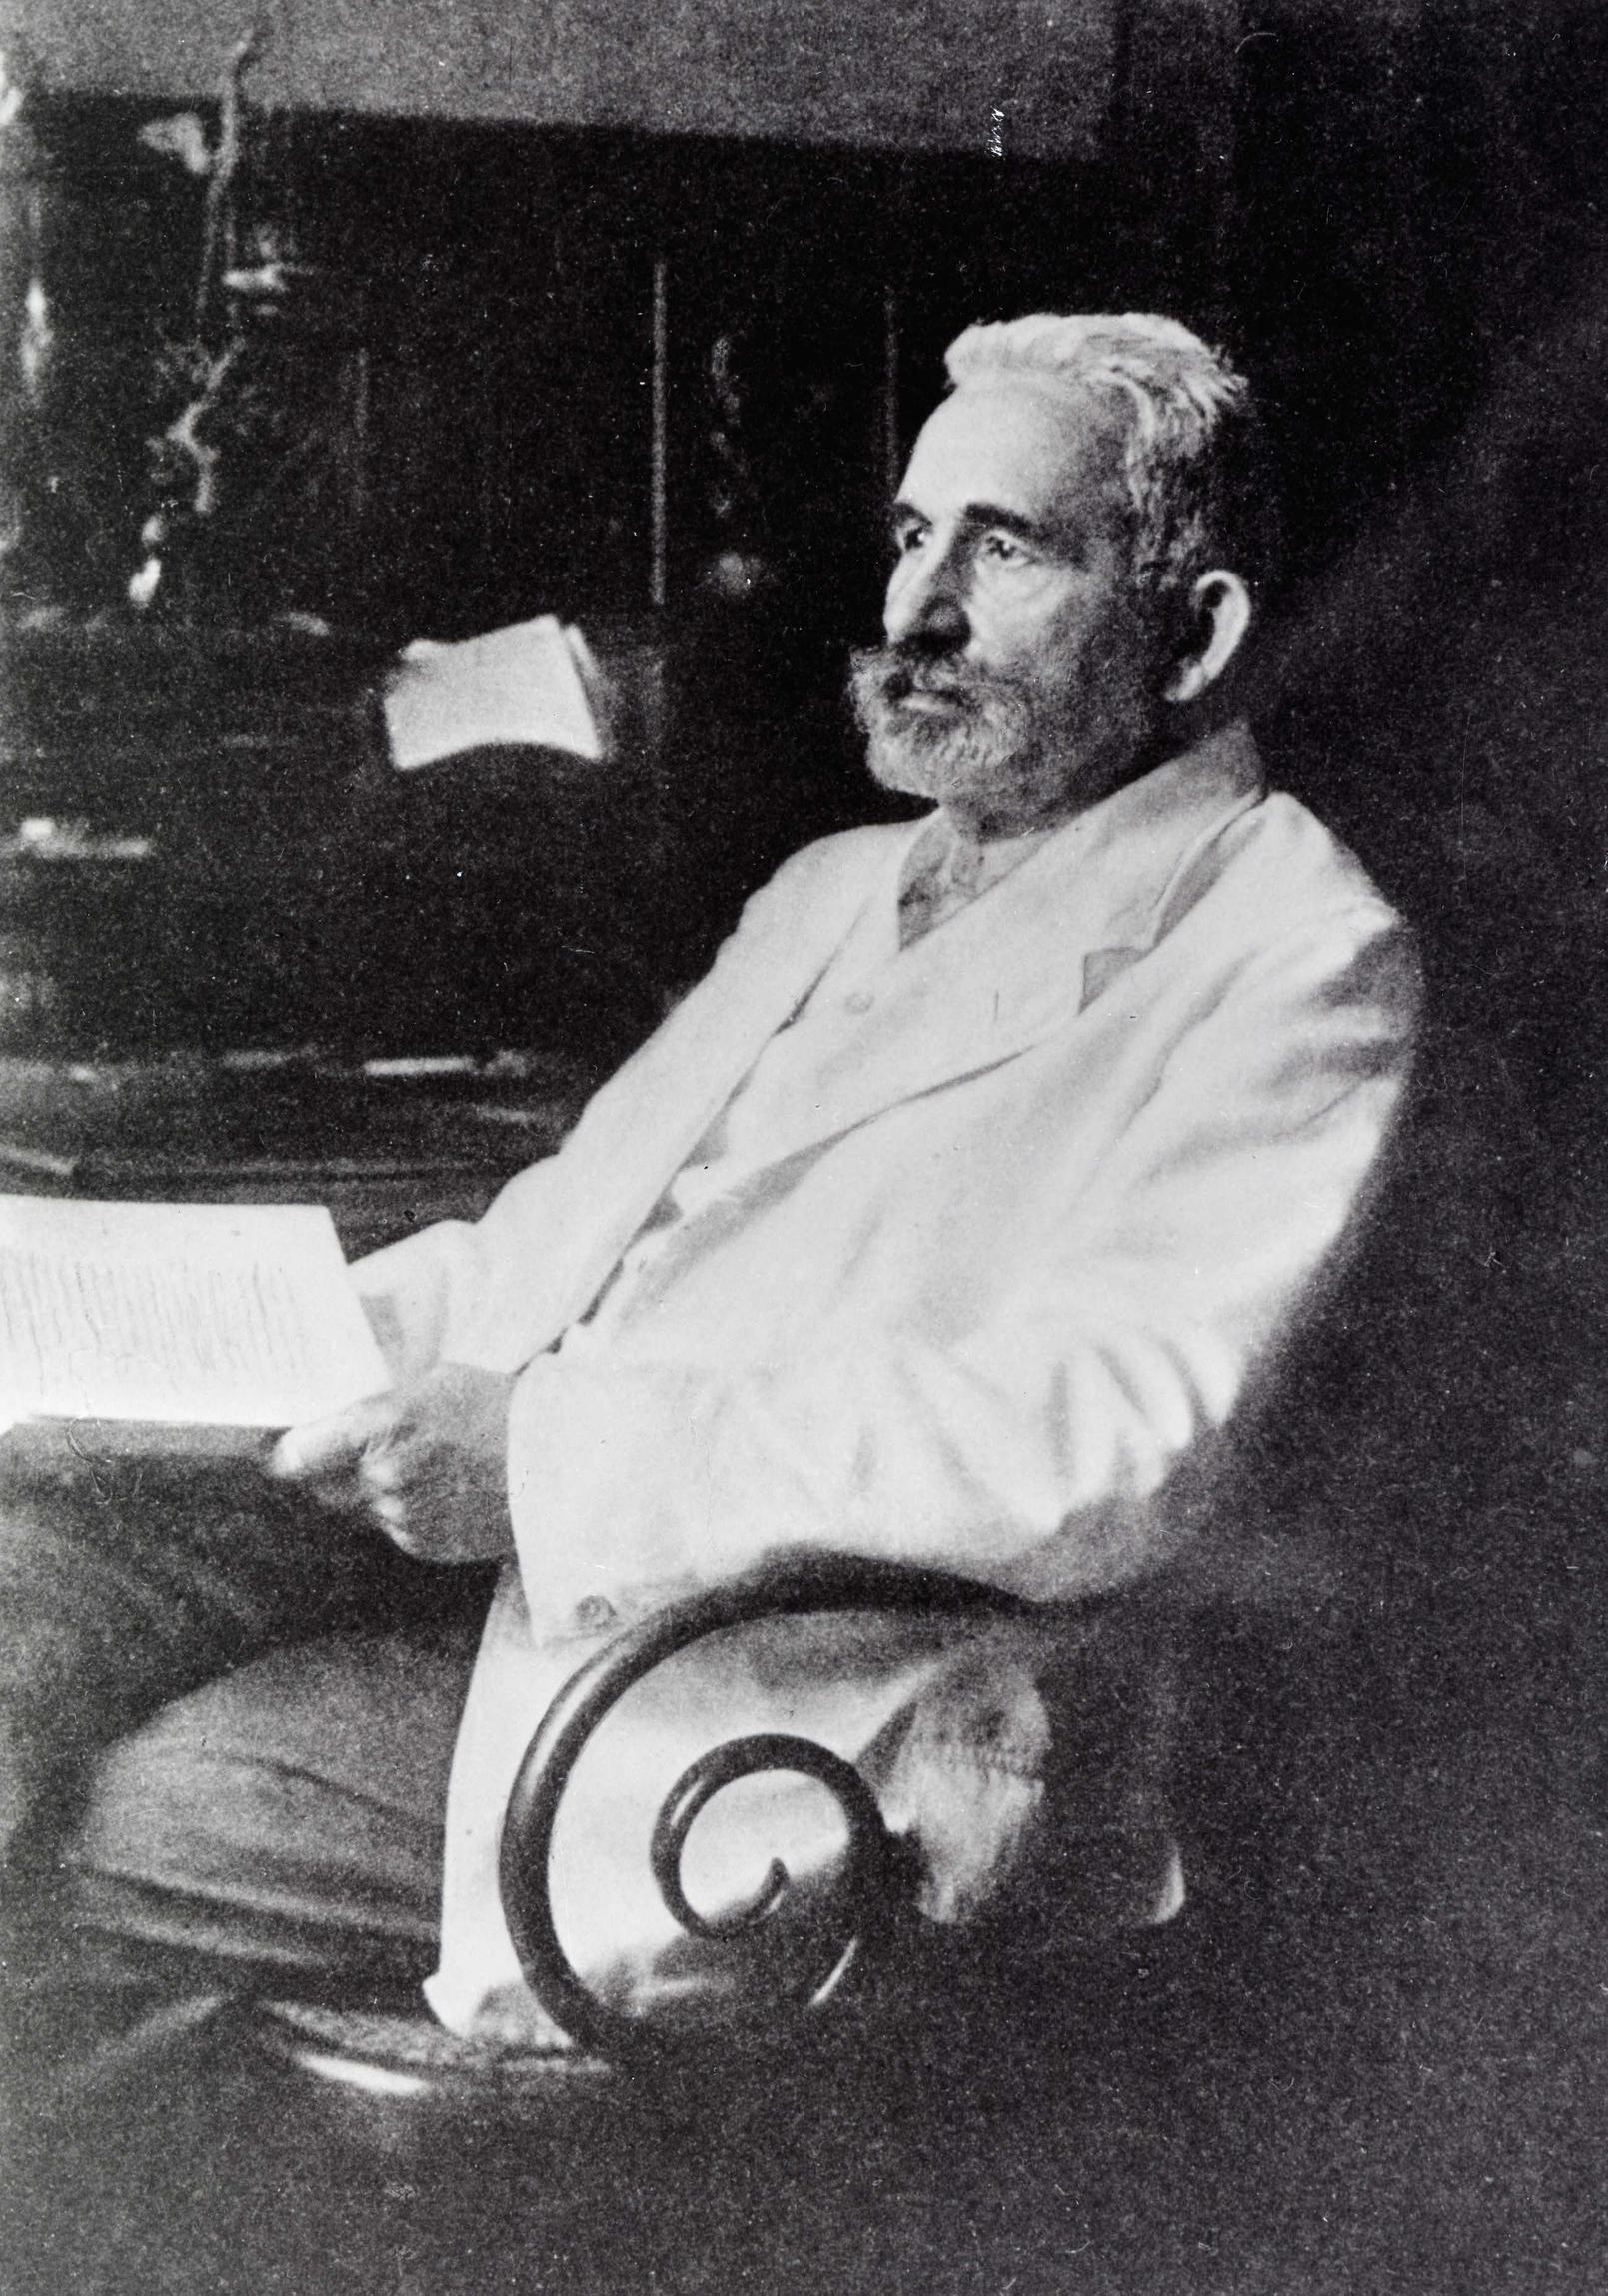 Emil Kraepelin LMU Psychiatrie